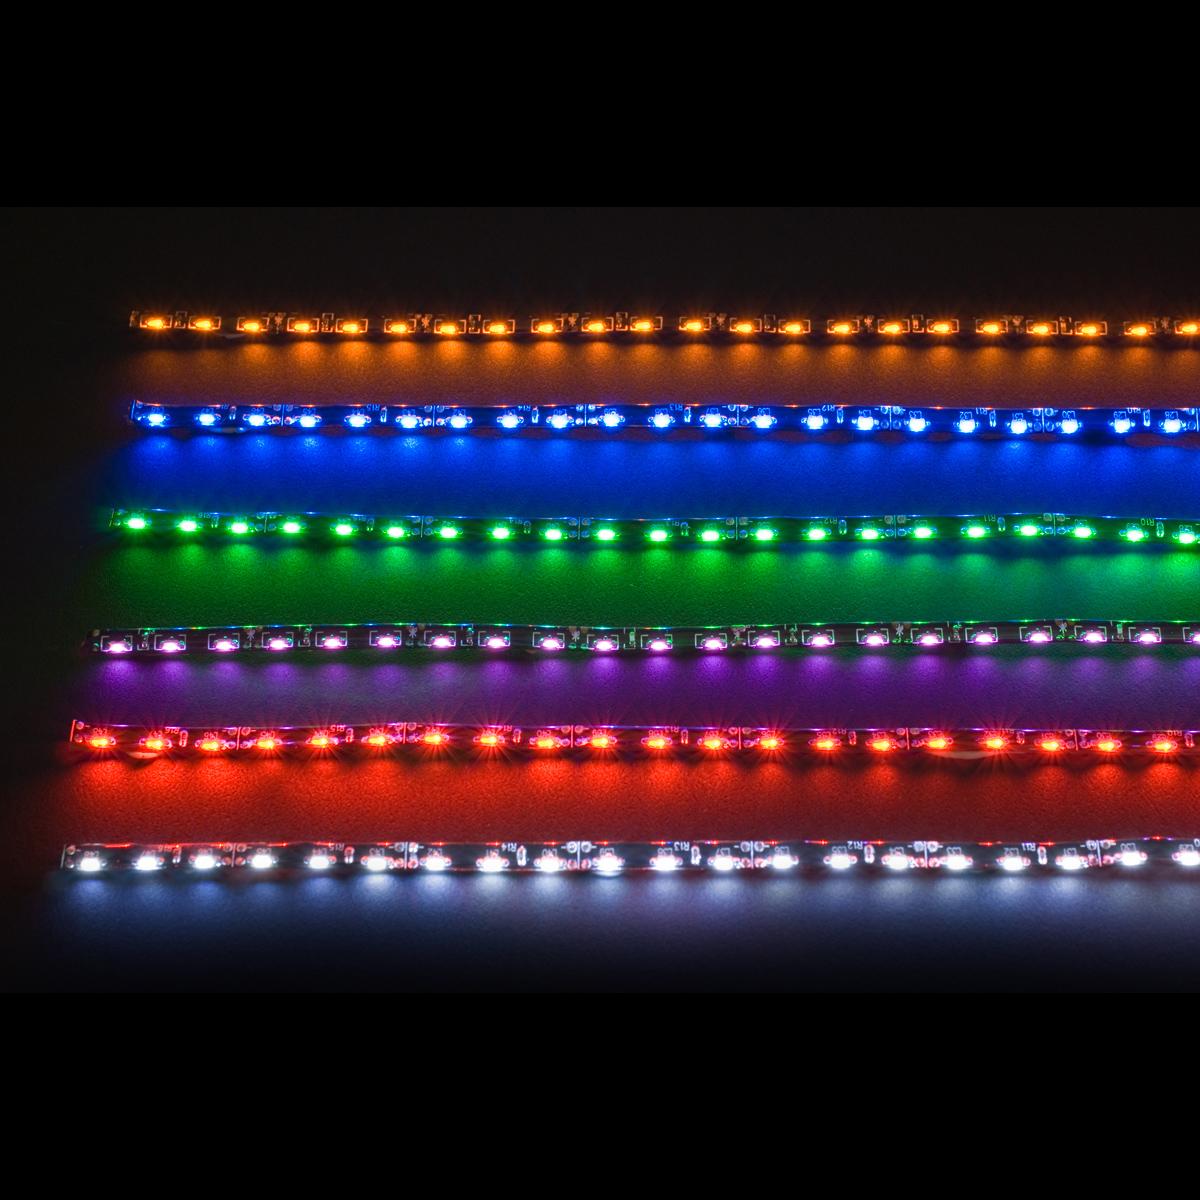 Add on amber side emitting led light strips 805 138 add on amber side emitting led light strips aloadofball Choice Image